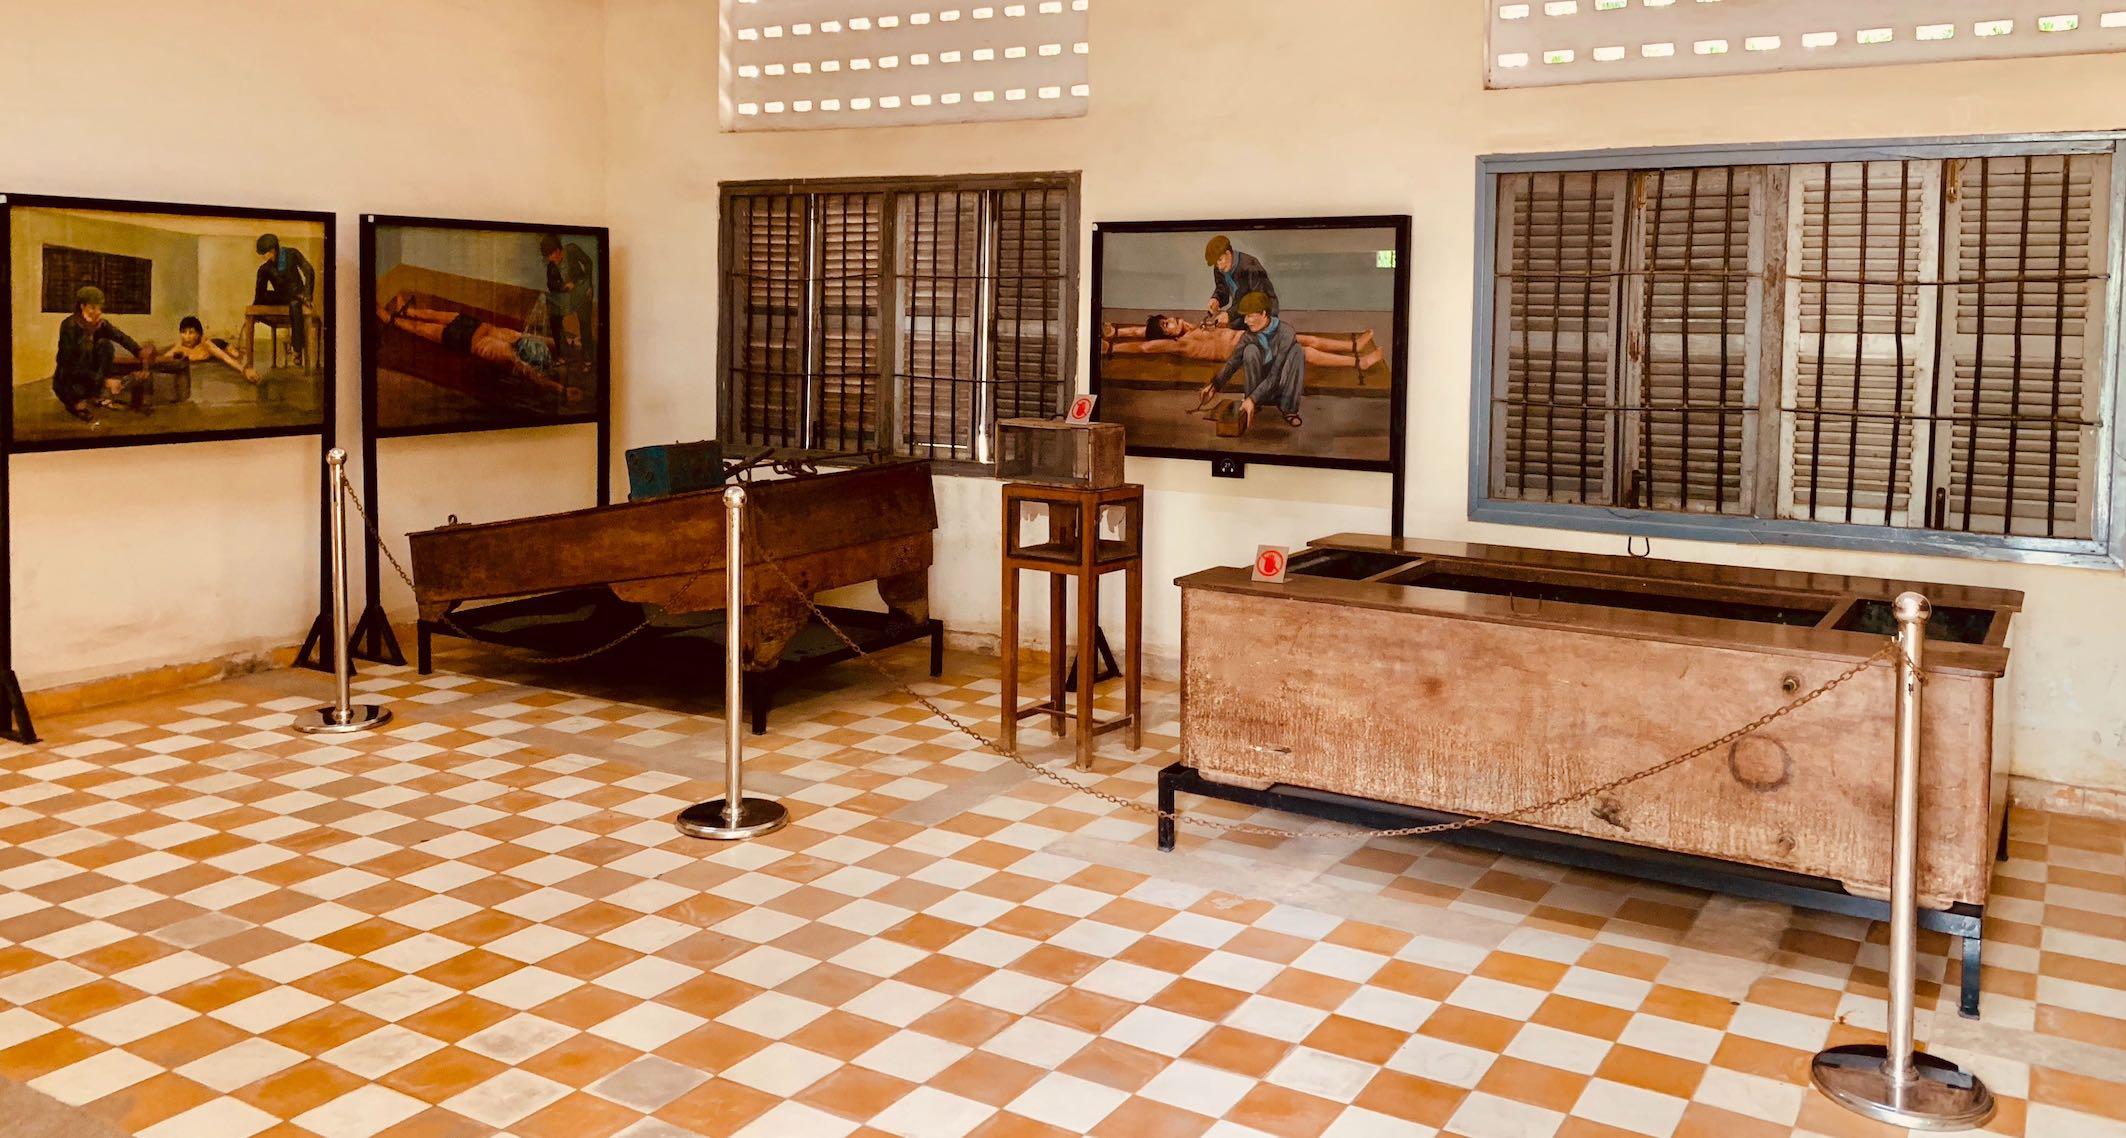 Instruments of torture S-21 Prison Cambodia